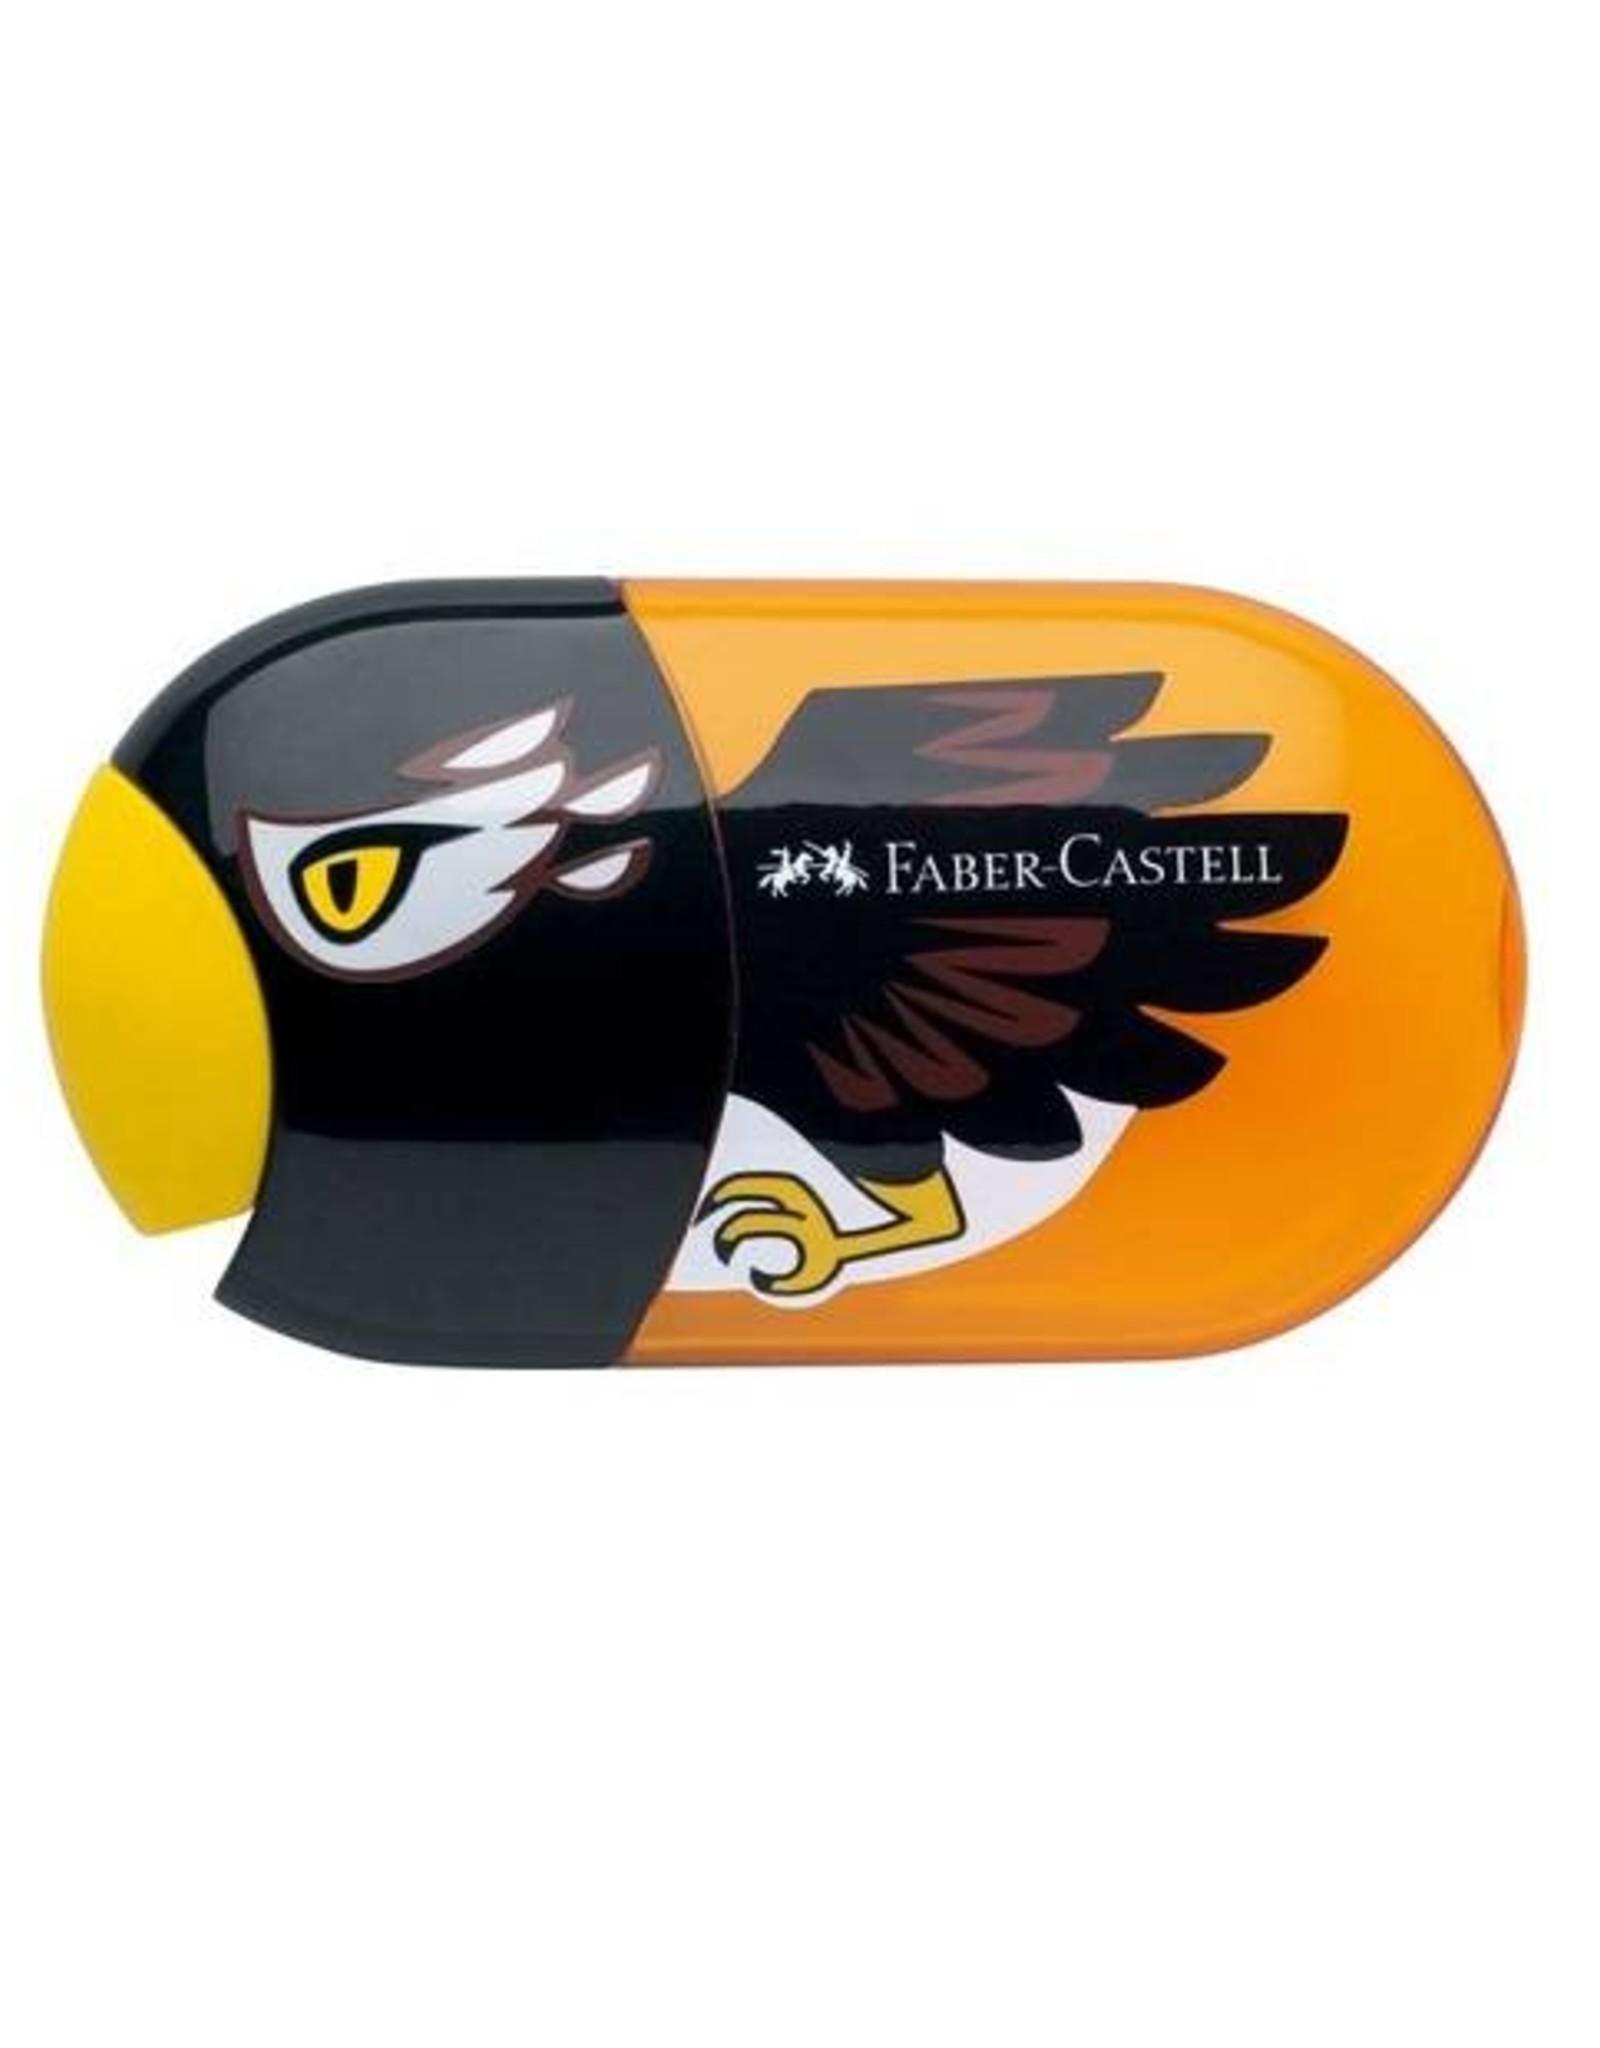 Faber Castell Pencil Sharpener